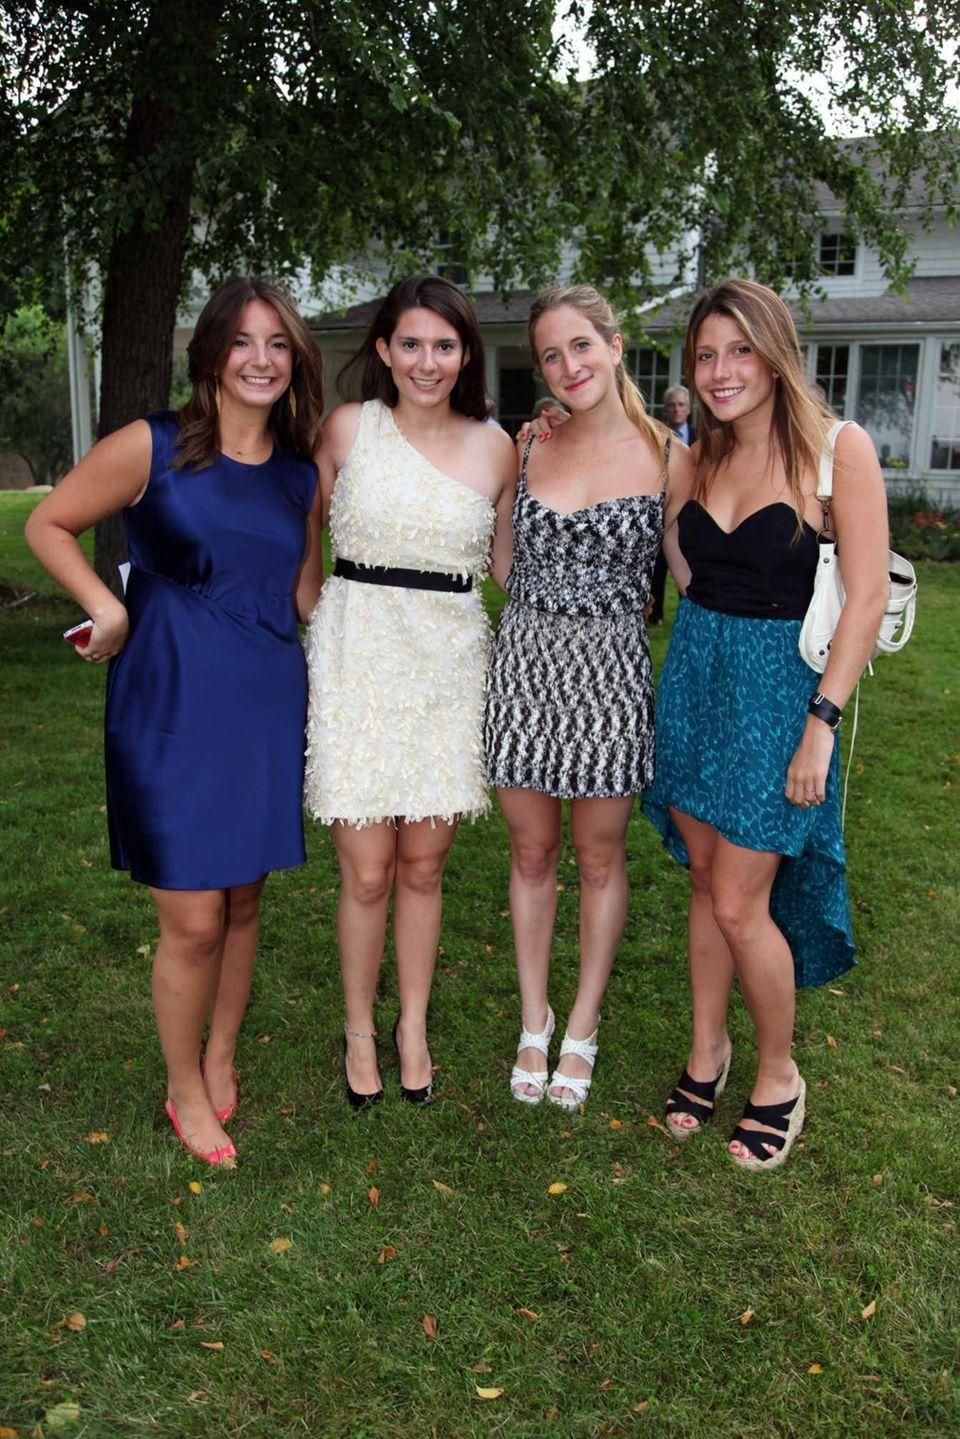 Ema Ricardi, Isabelle Ricardi, Jessica Kempner, and Charlotte